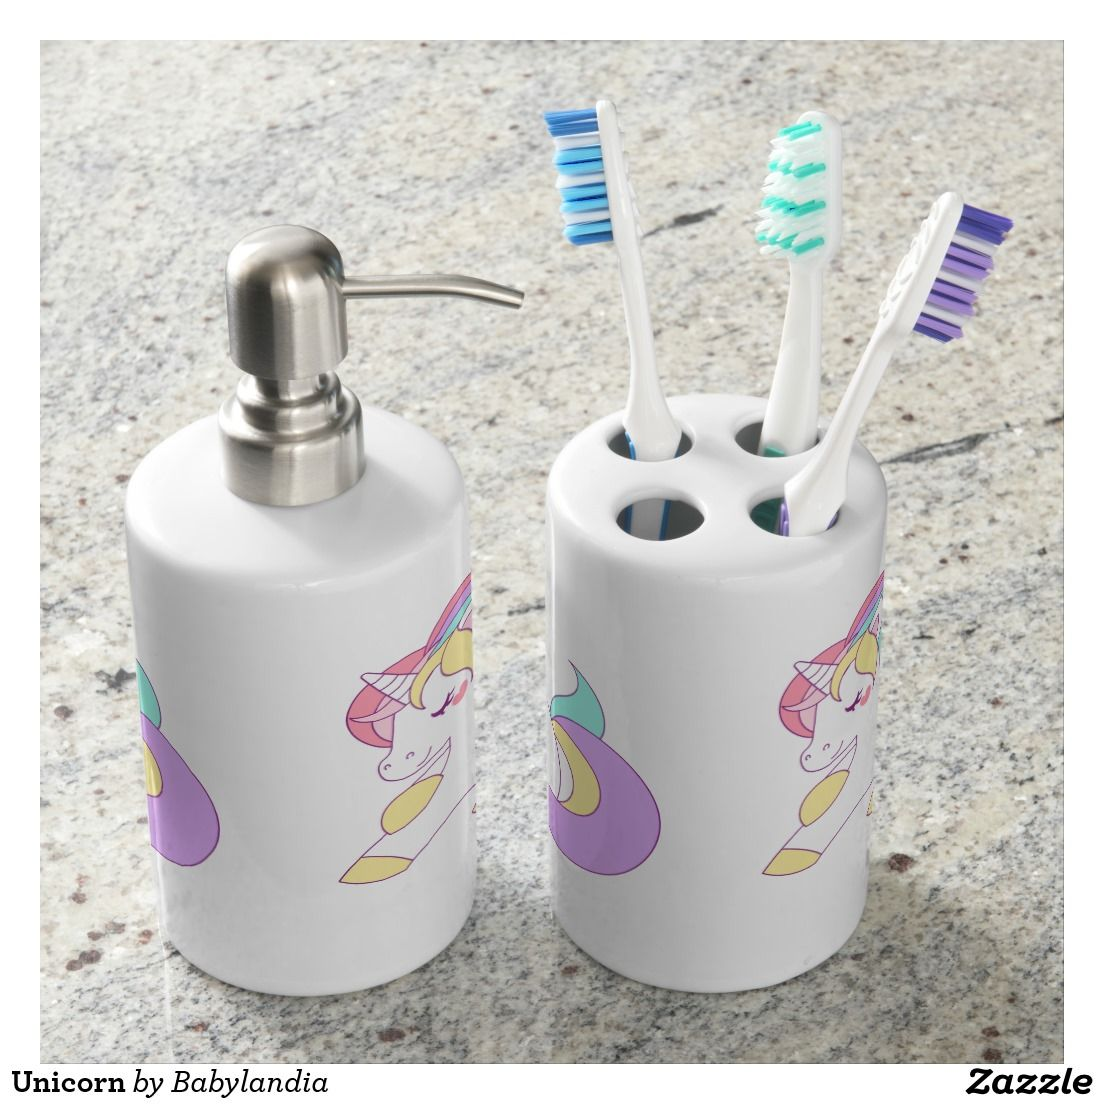 Unicorn Bathroom Set  Zazzle.com  Bath accessories set, Brushing